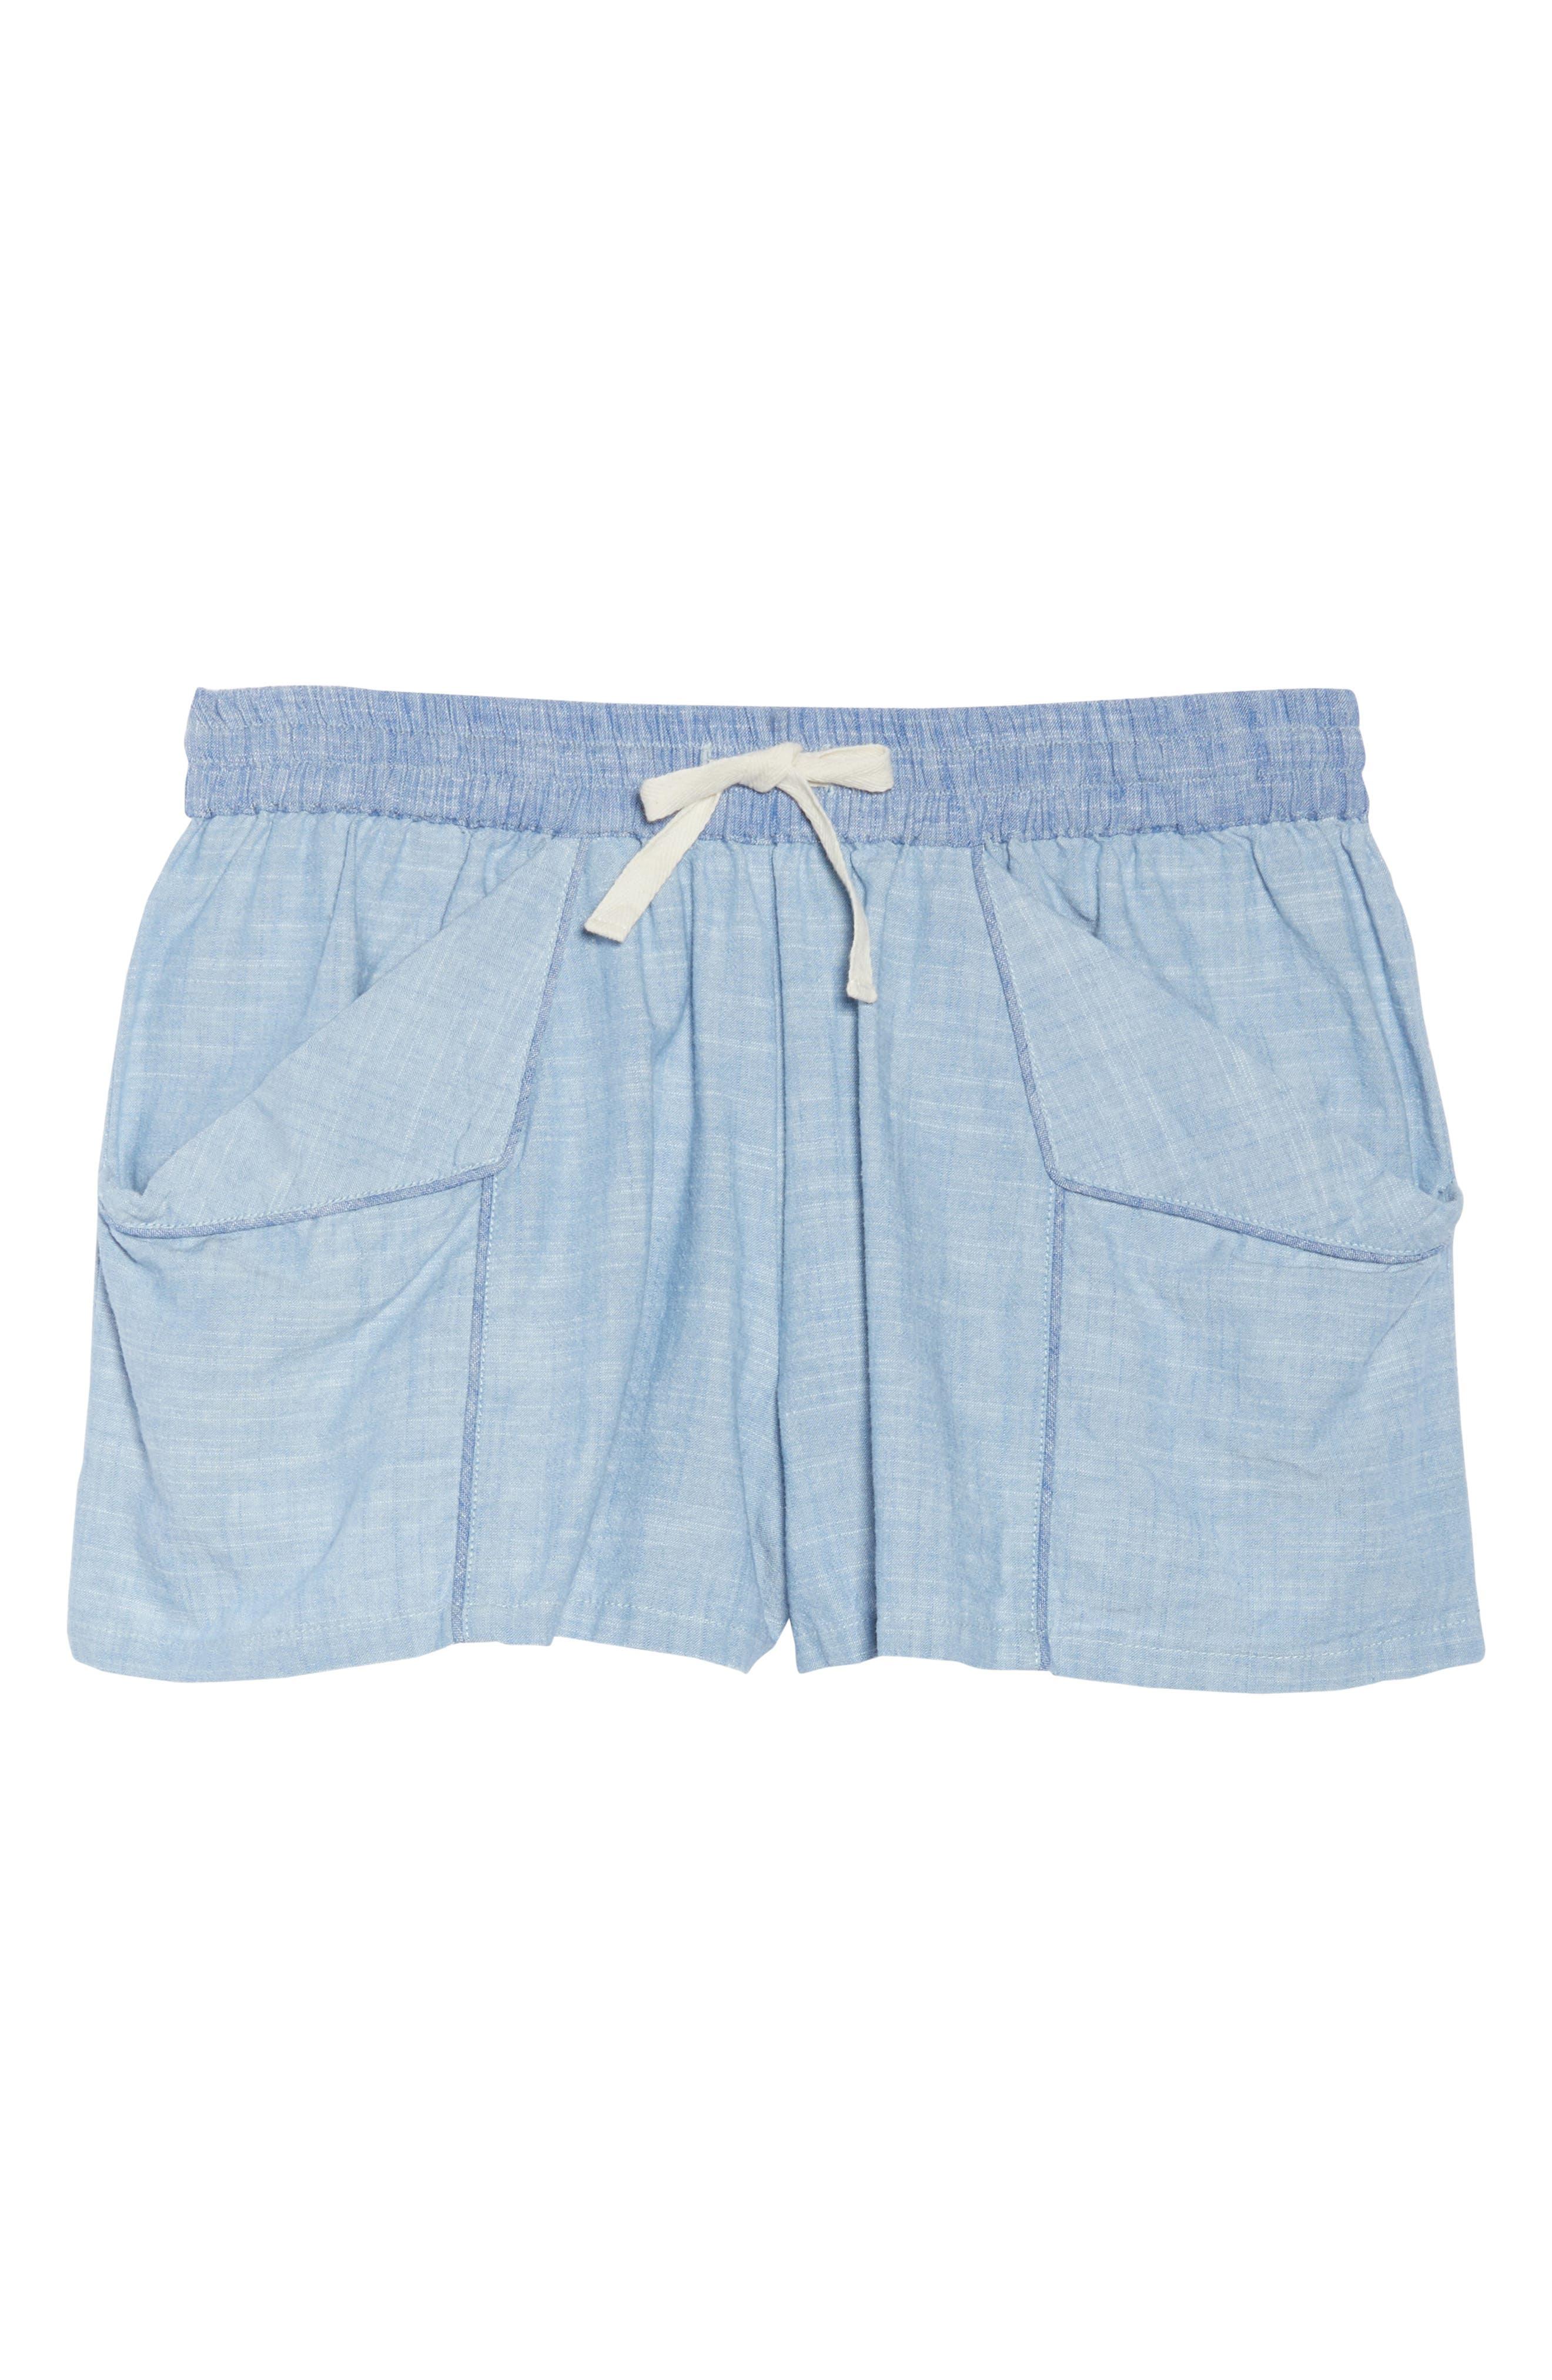 Jude Pajama Shorts,                             Alternate thumbnail 6, color,                             458